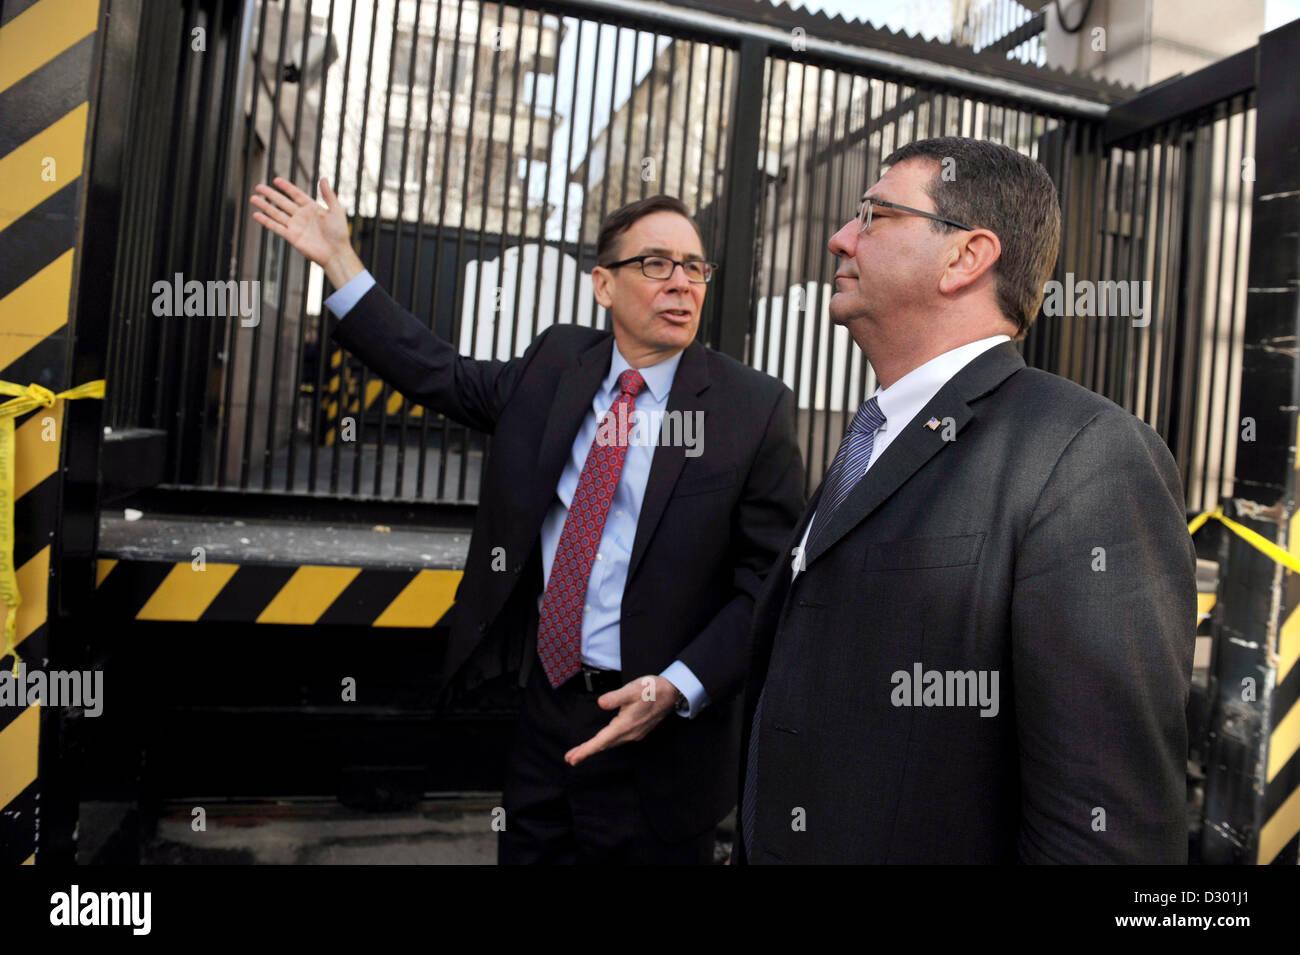 US Deputy Secretary of Defense Ashton Carter accompanied by Jess Baily, Deputy Chief of Mission, views damage to - Stock Image